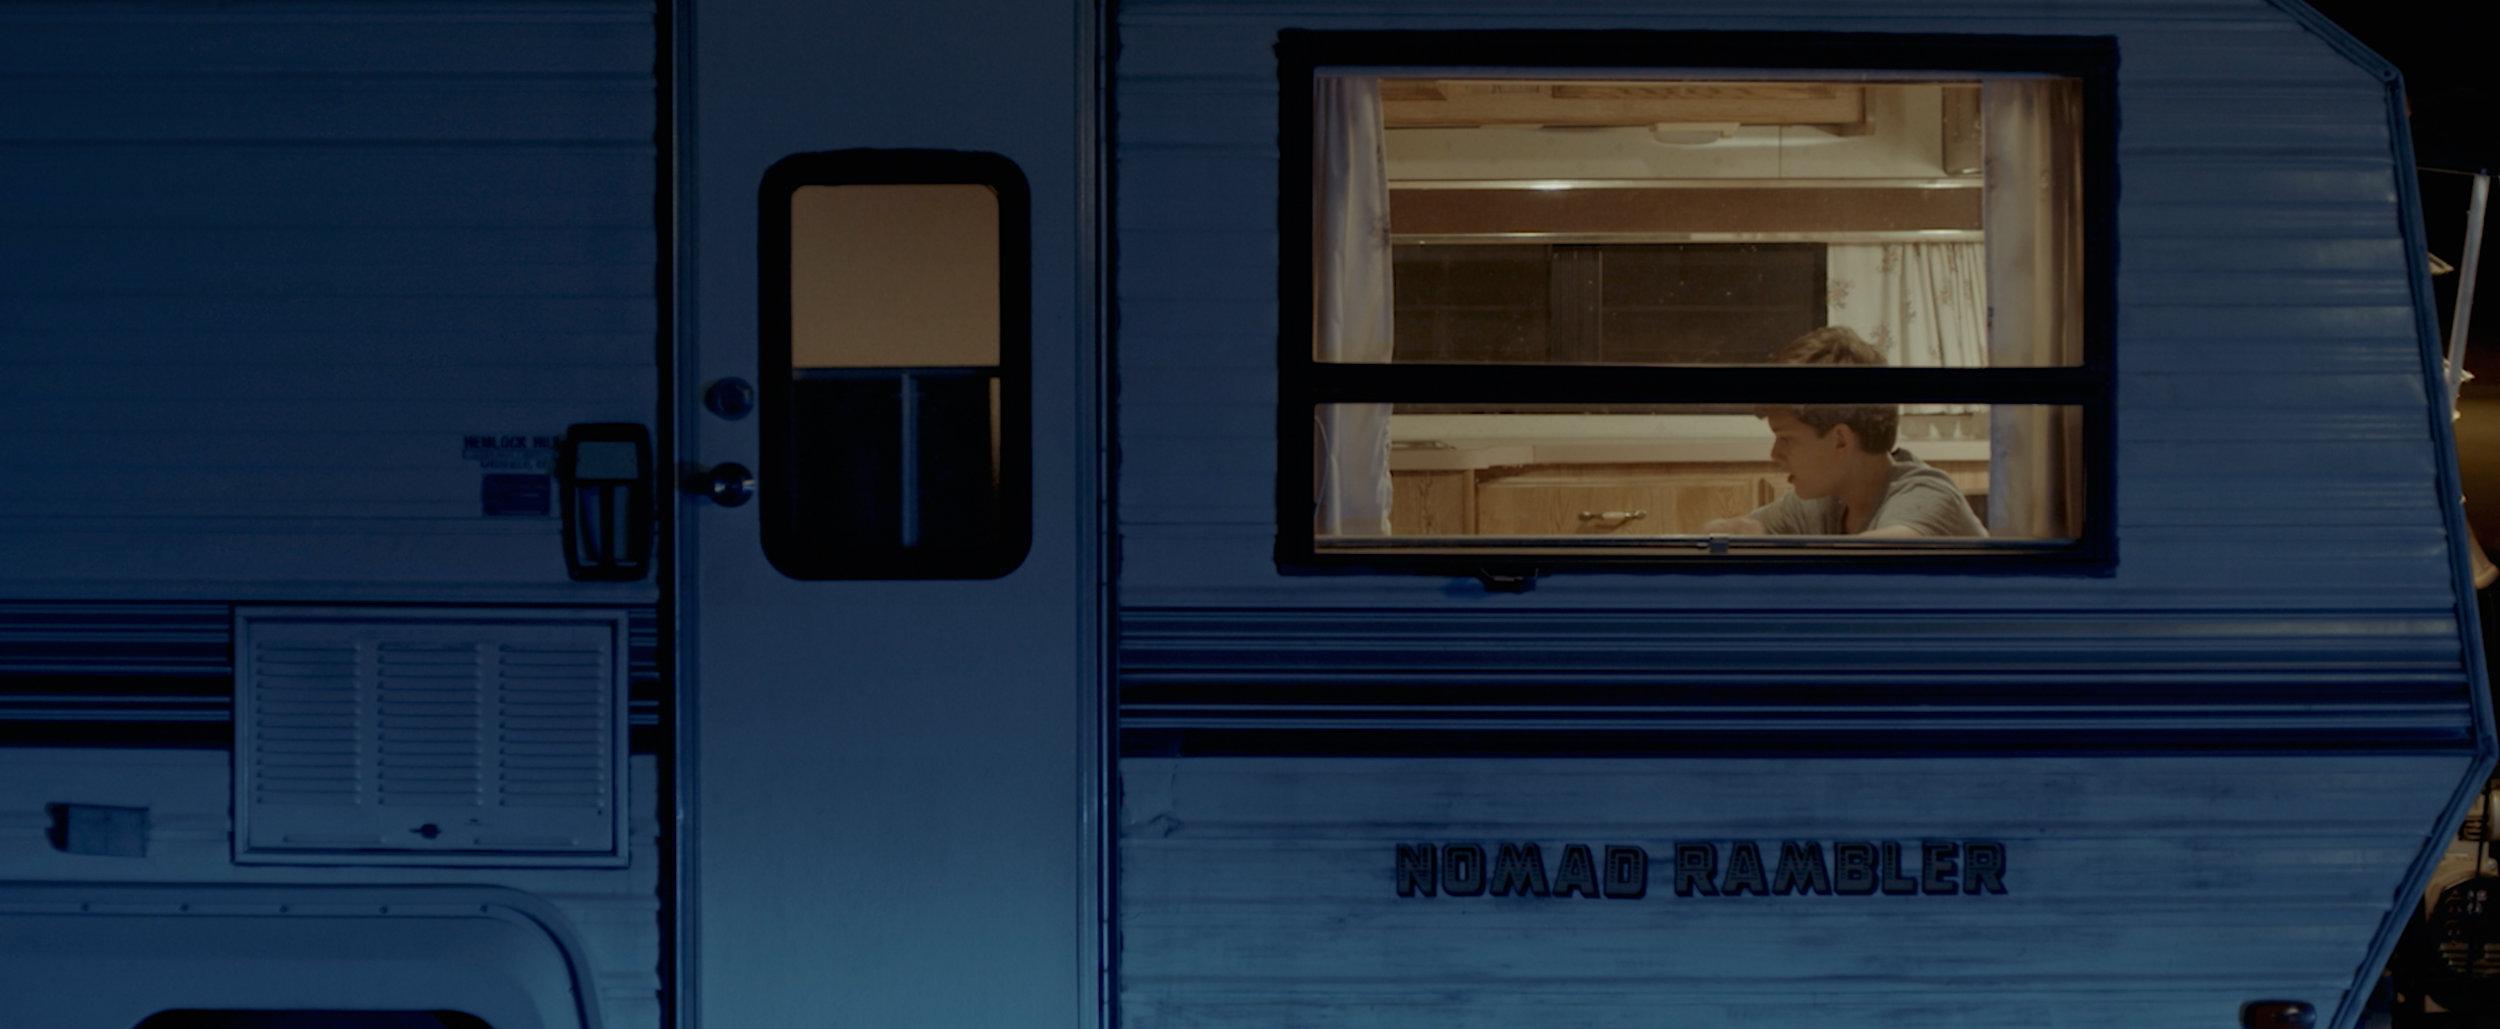 Nomad Rambler - dir. Ryan Cook